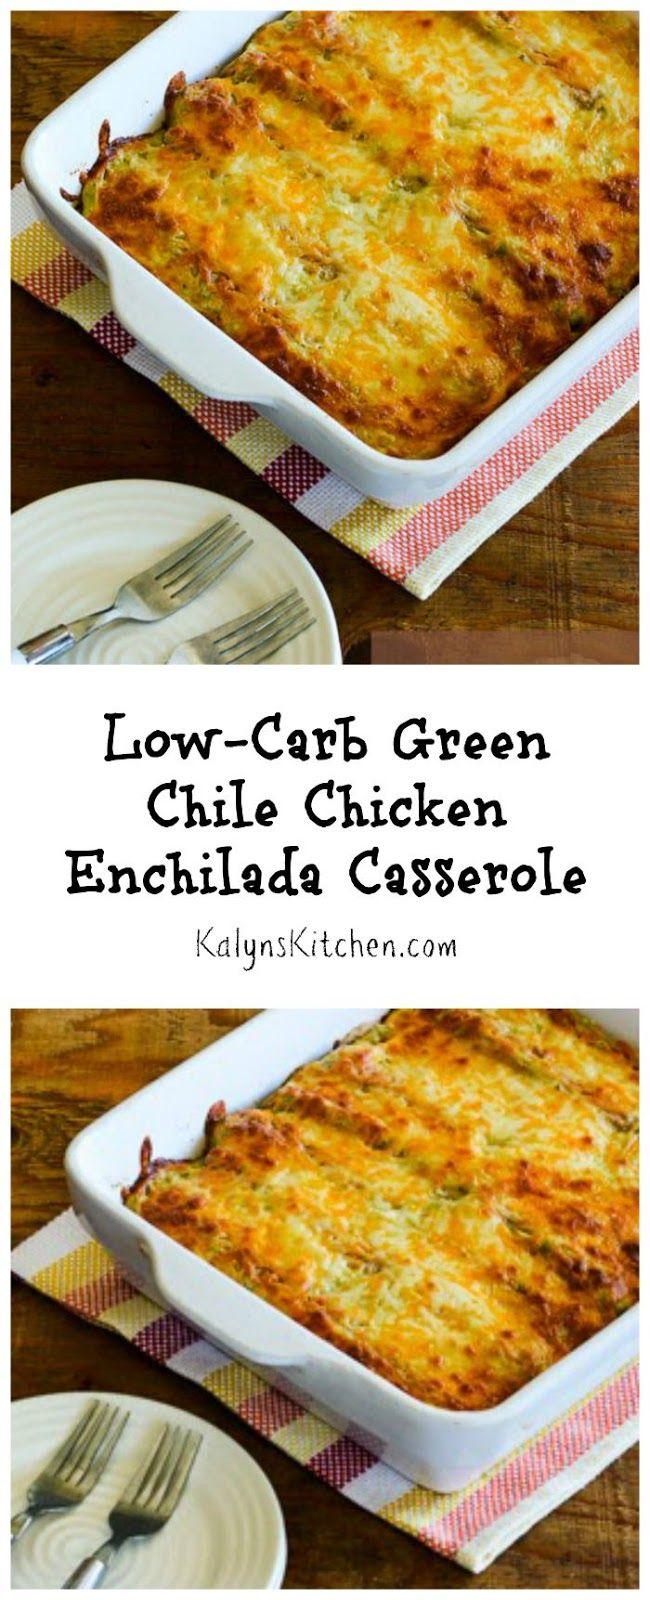 Low Carb Green Chile Chicken Enchilada Casserole Recipe Best